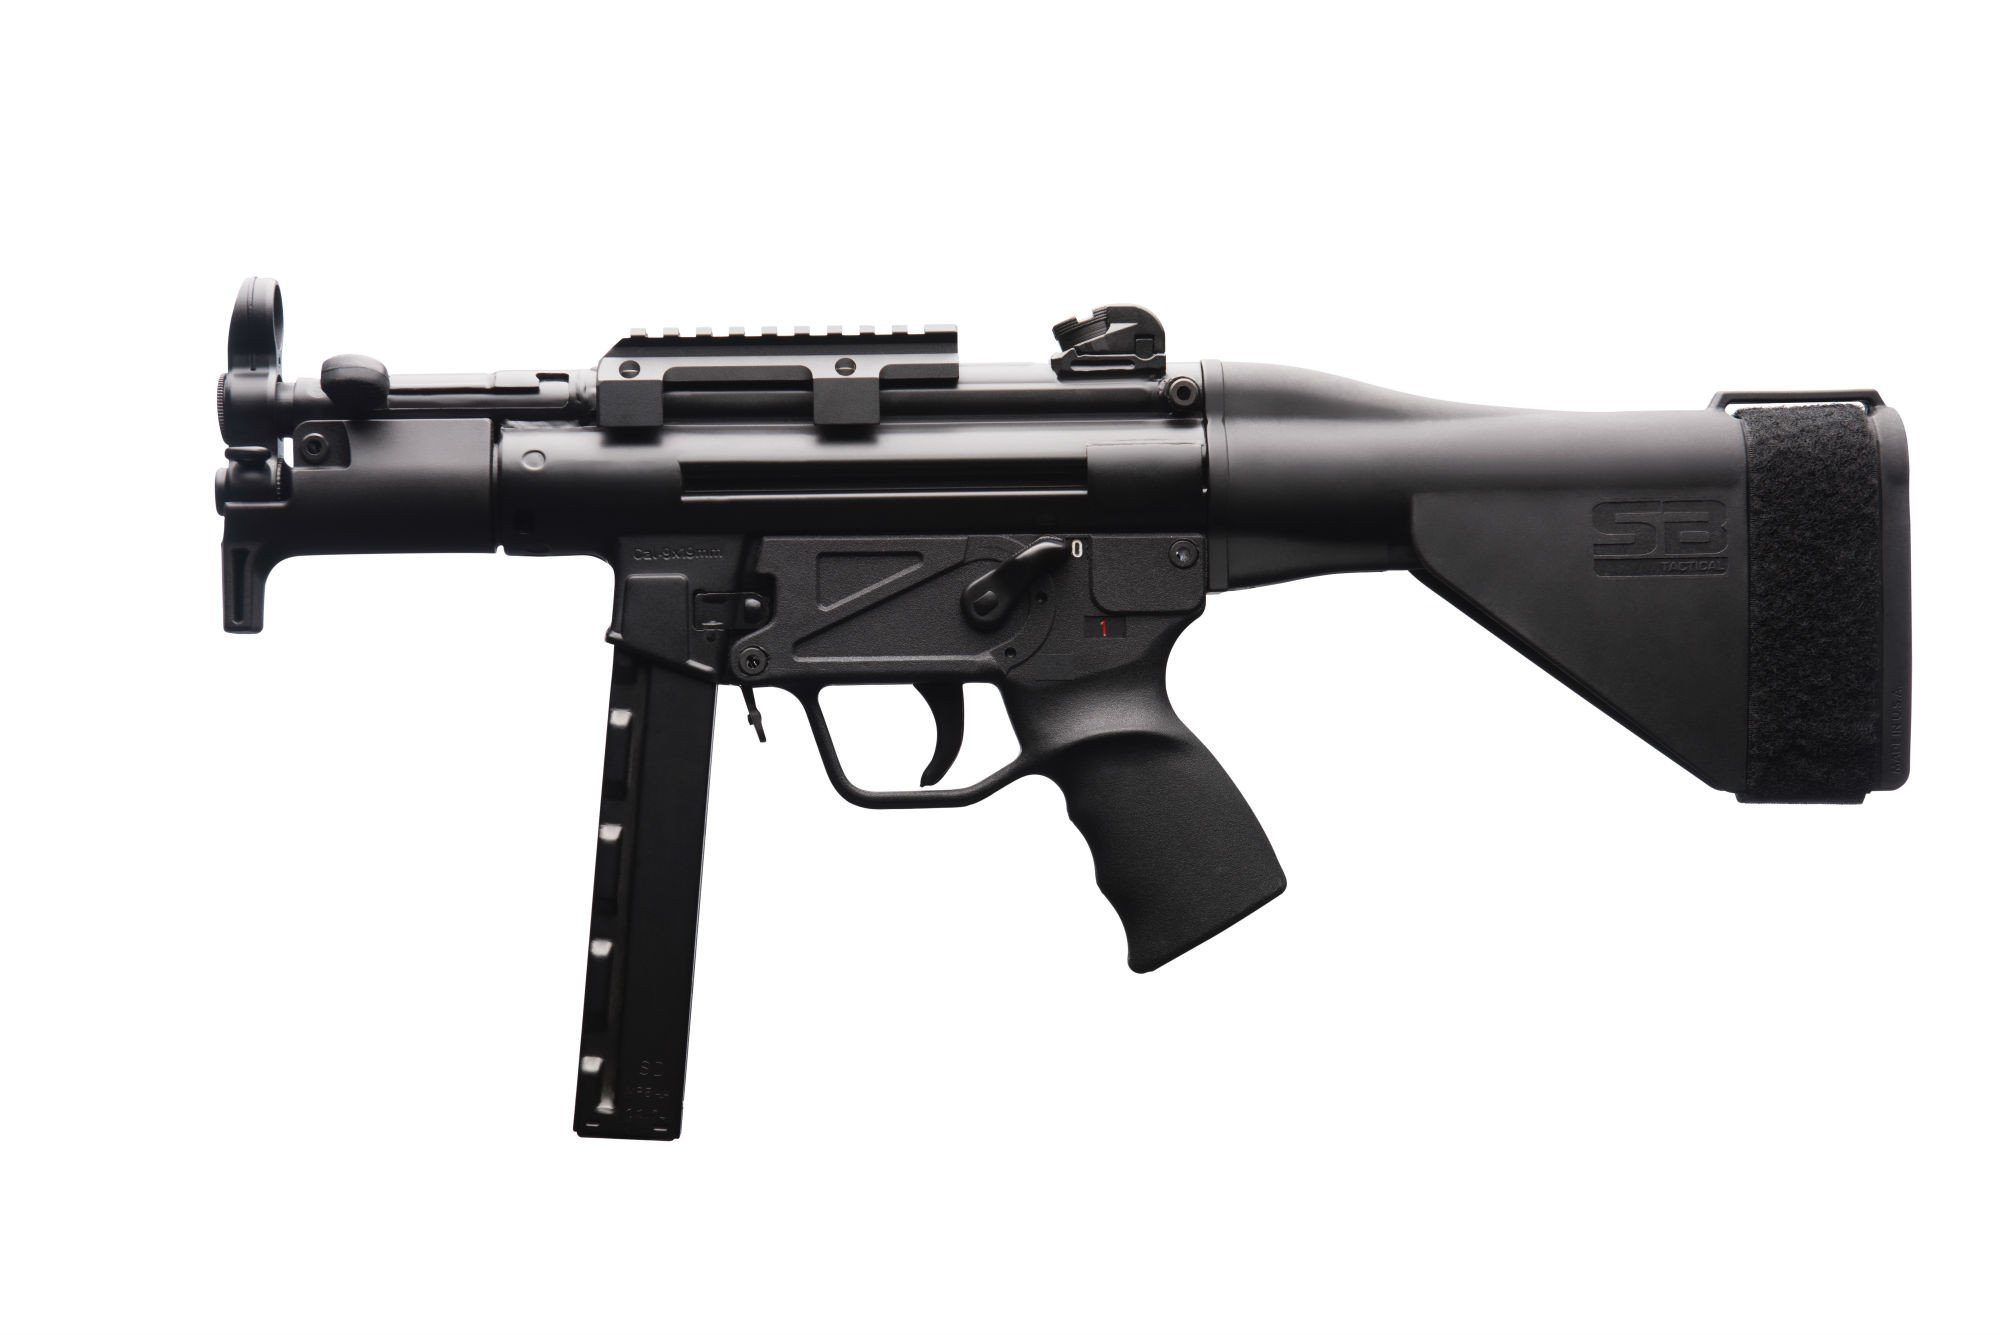 SB Tactical SB5K Pistol Stabilizing Brace